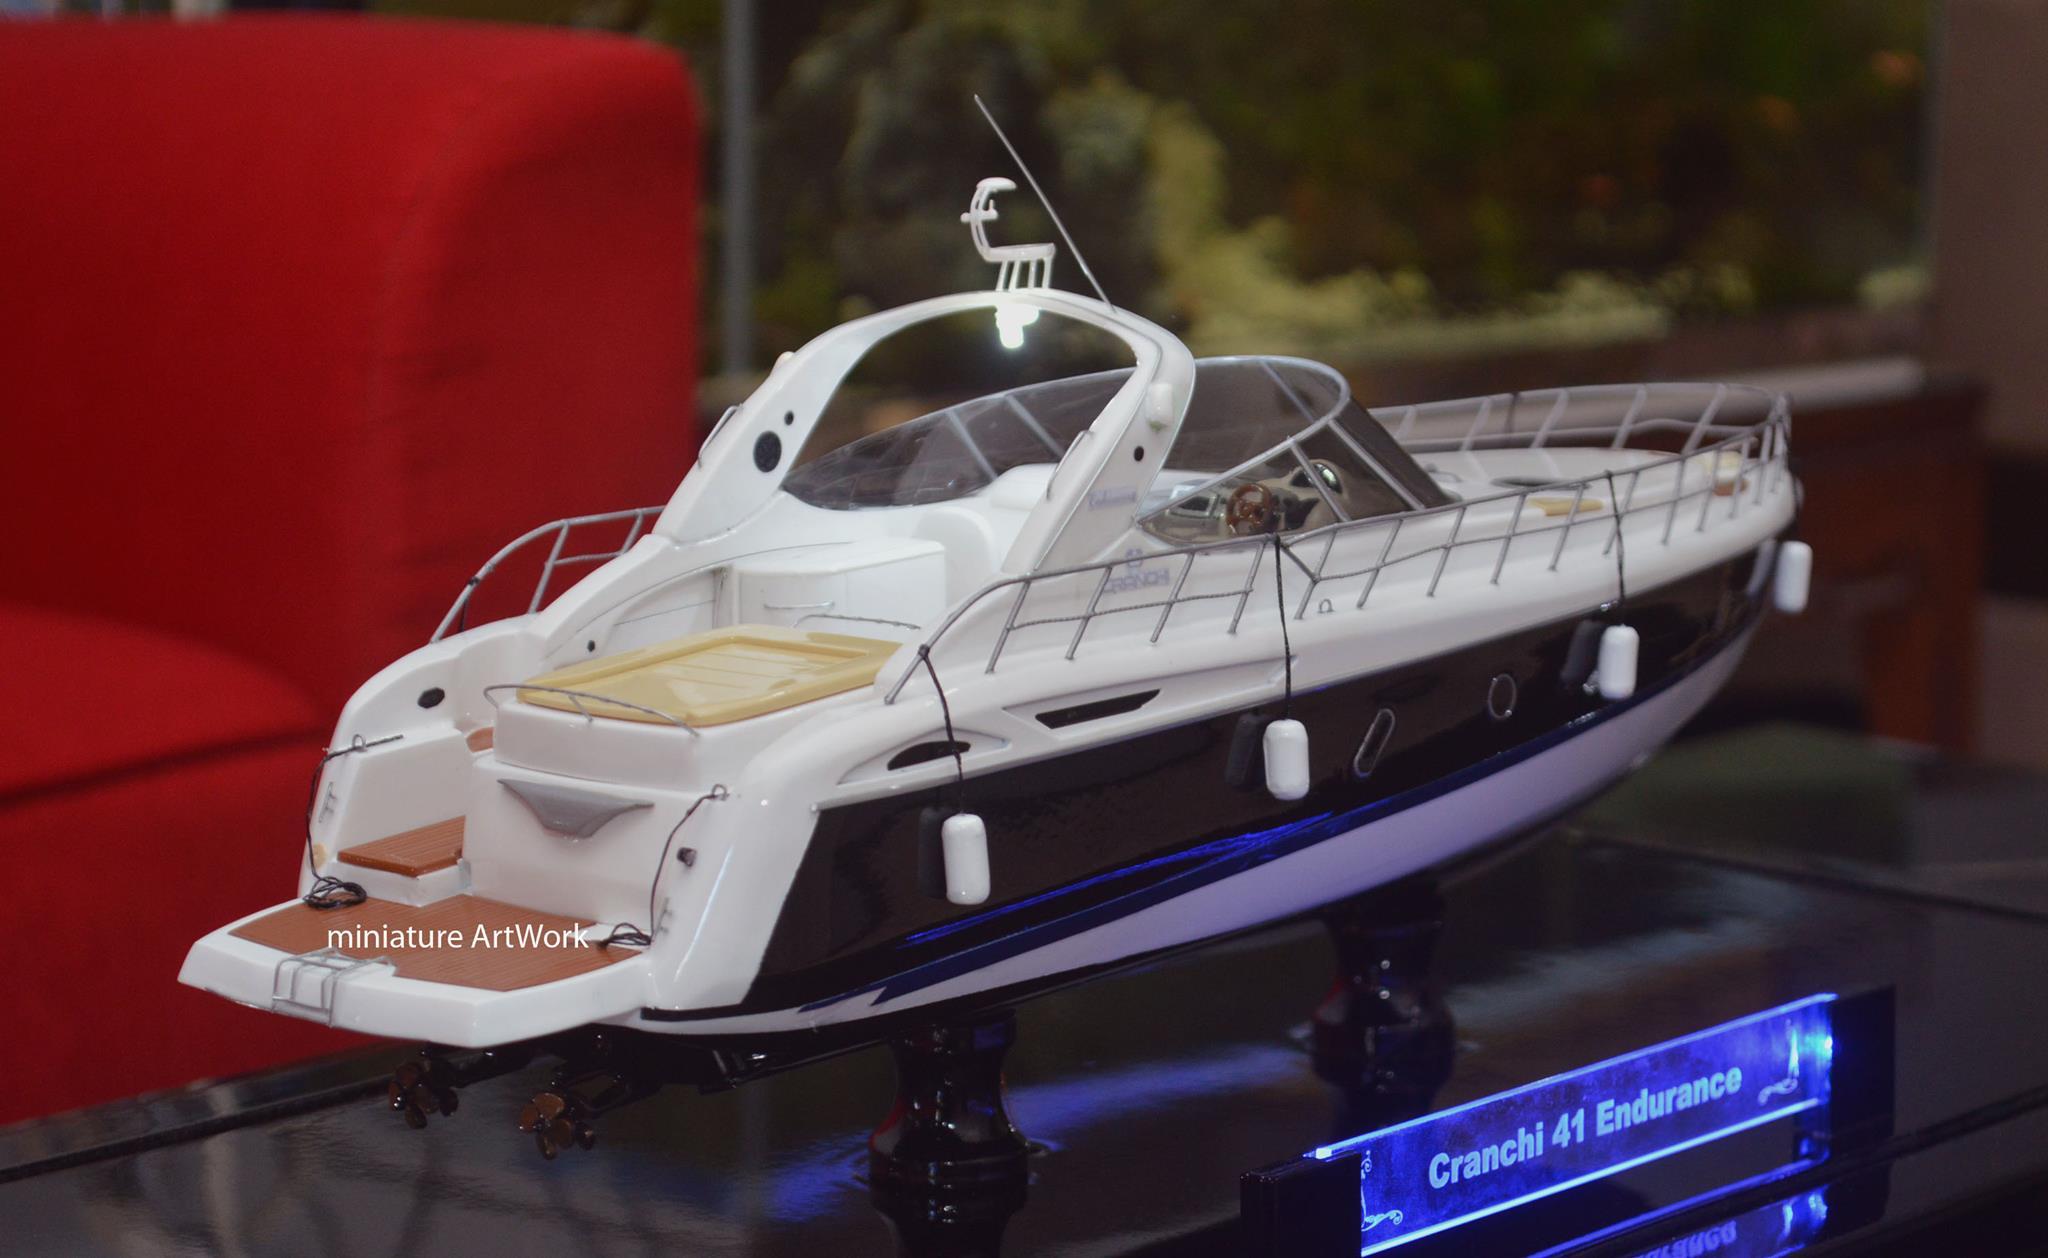 pembuat produsen pengrajin miniatur kapal cranchi 41 endurance planet kapal indonesia rumpun artwork terpercaya